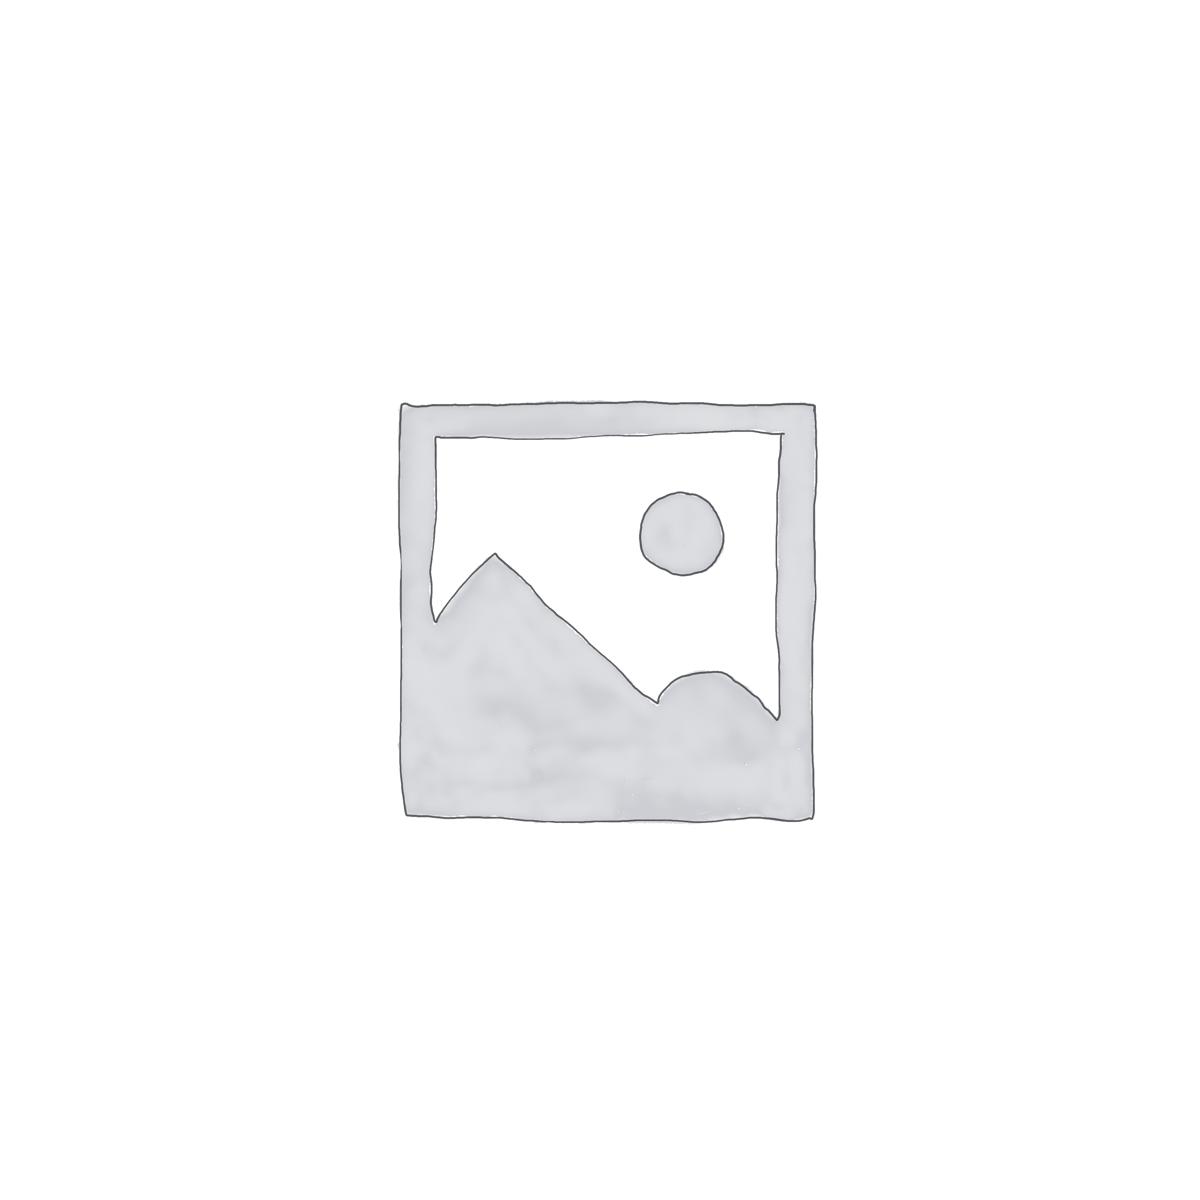 web-pipa-de-agua-75cm-halcon-roja-2